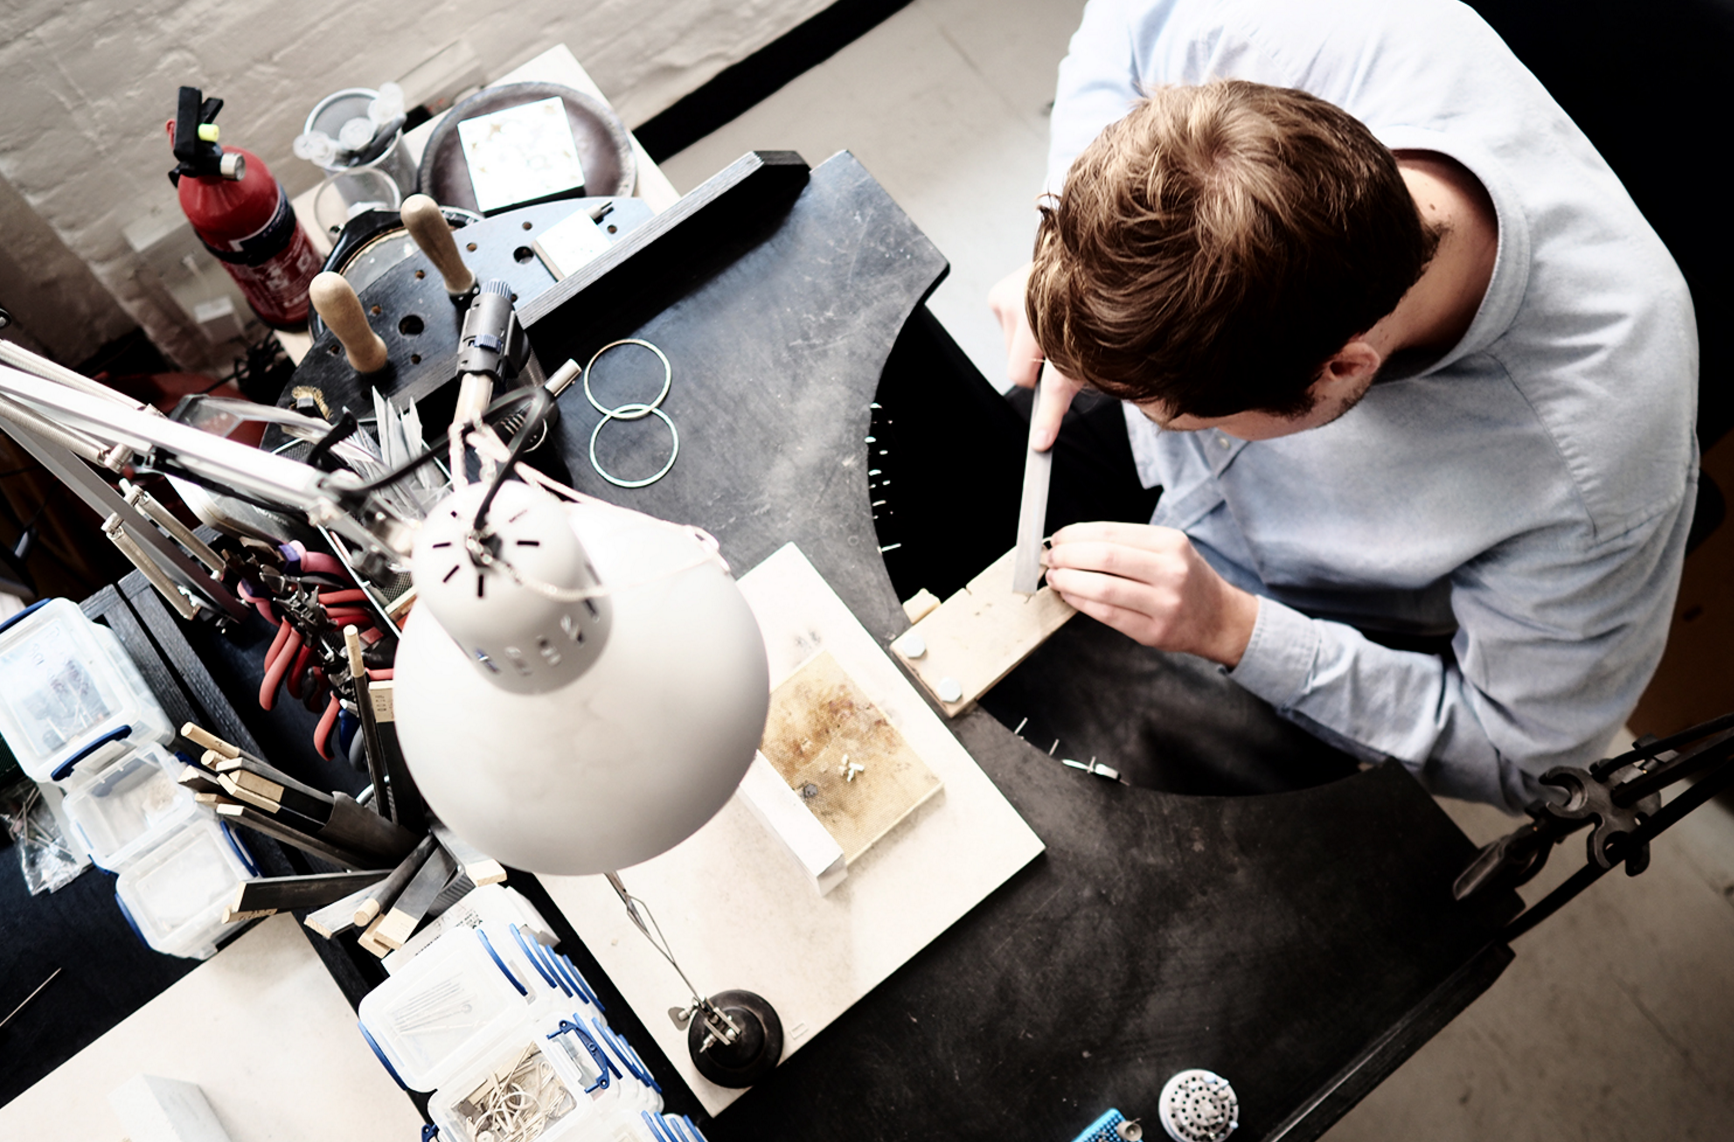 Matthew Calvin at work in his studio